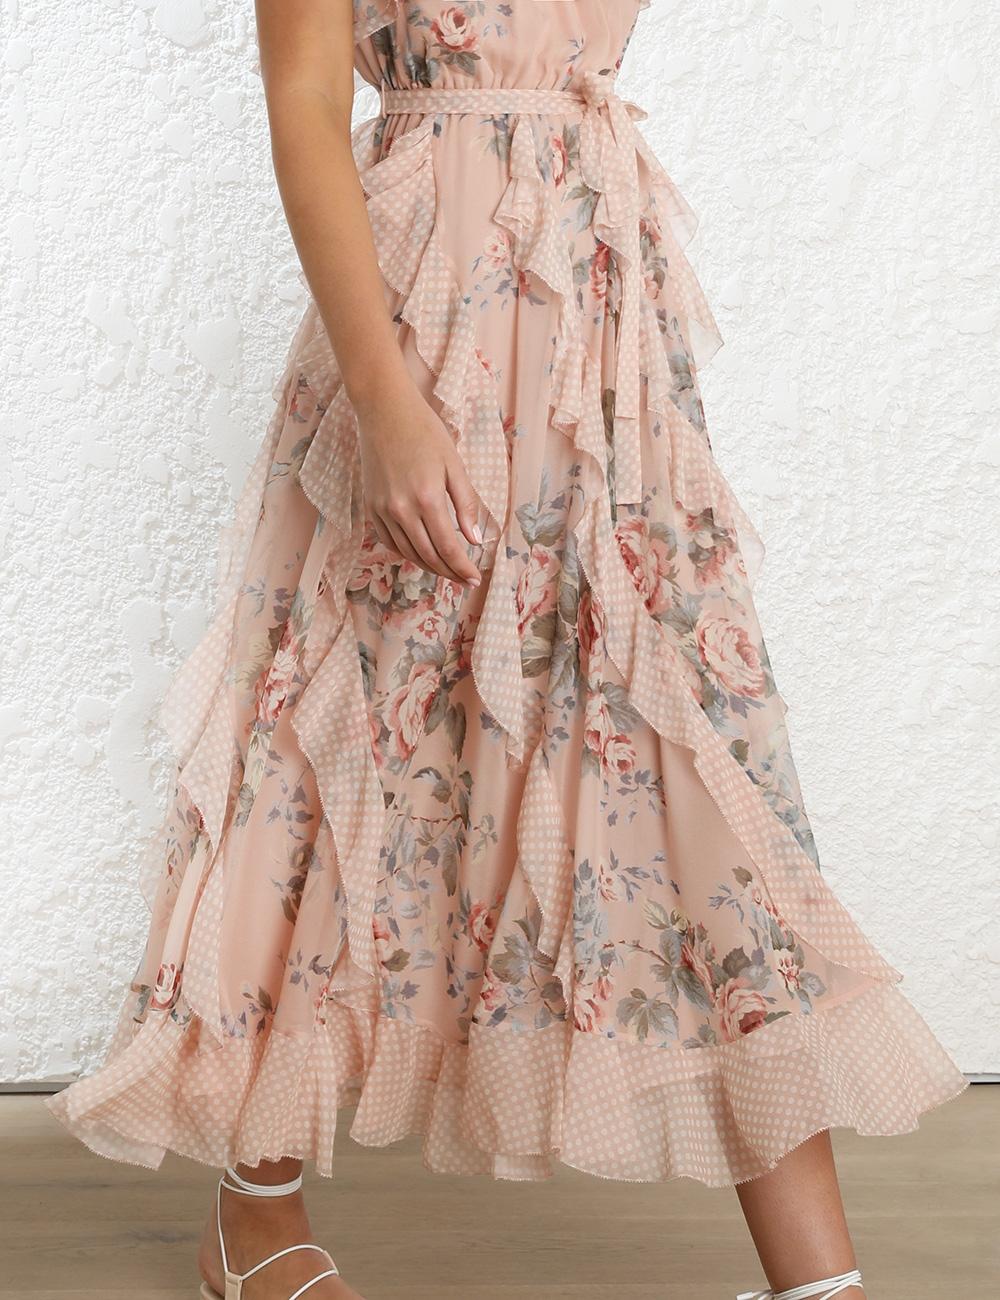 Bowie Waterfall Dress